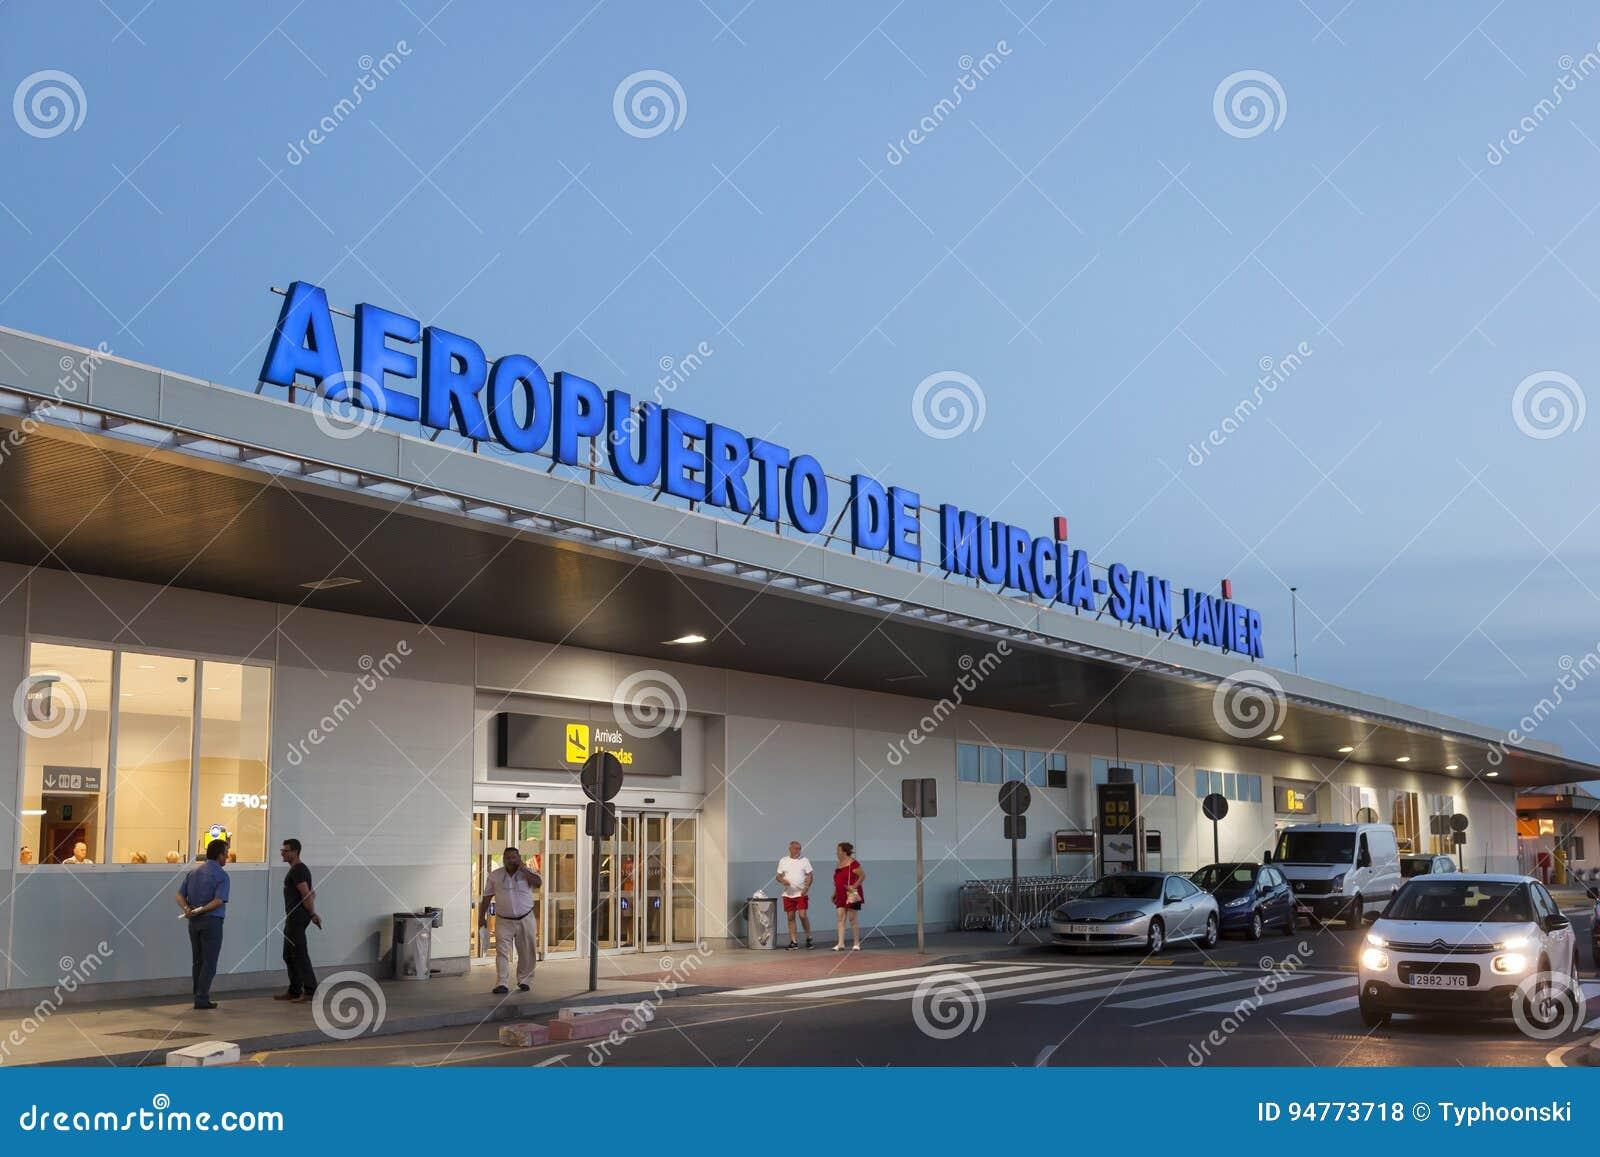 San Javier Airport In Murcia Spain Editorial Stock Photo Image Of